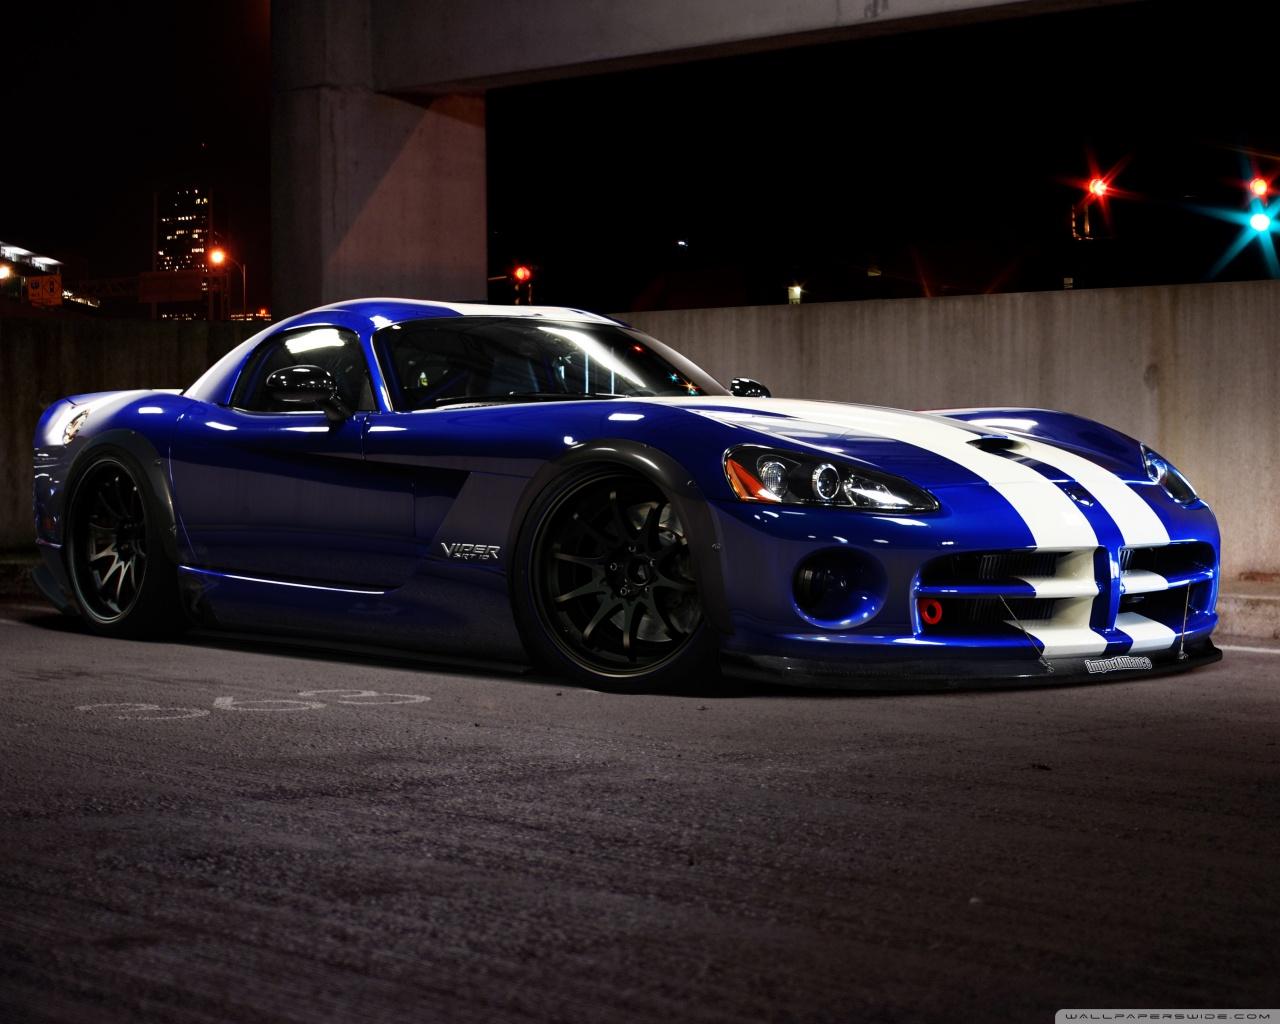 Dodge Viper Srt 10 Tuning 2603038 Hd Wallpaper Backgrounds Download